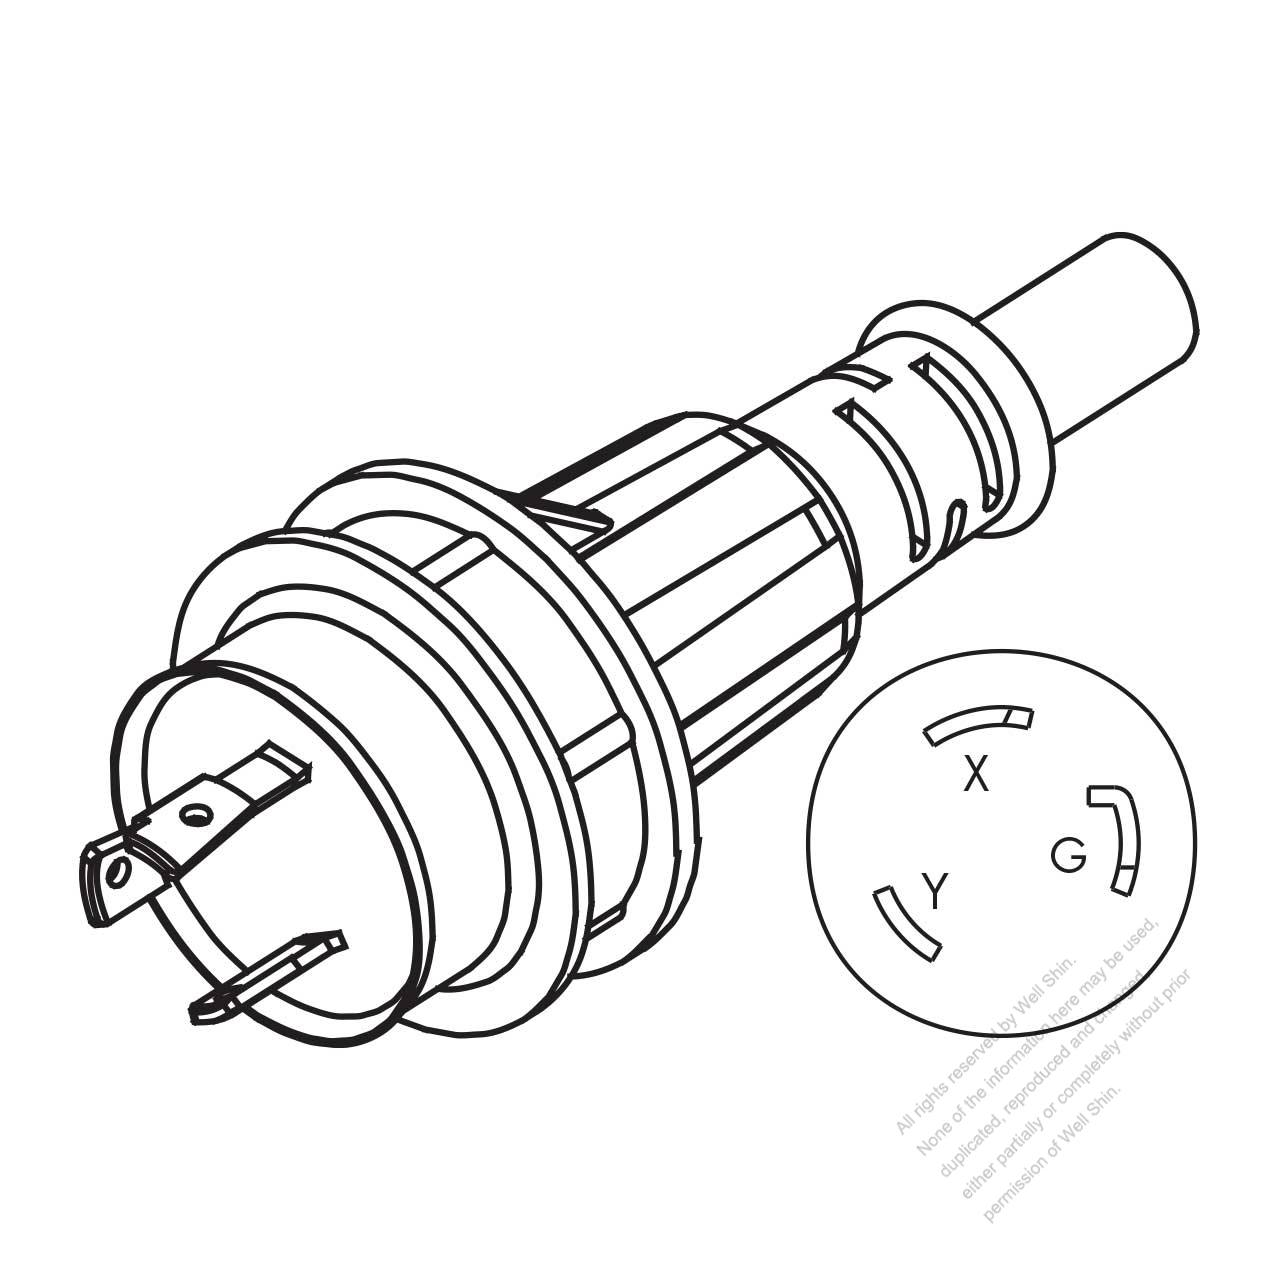 usa canada marine shore ac plug nema l6 30p twist locking 2 p 3 Nema L6-30P Plug usa canada marine shore ac plug nema l6 30p twist locking 2